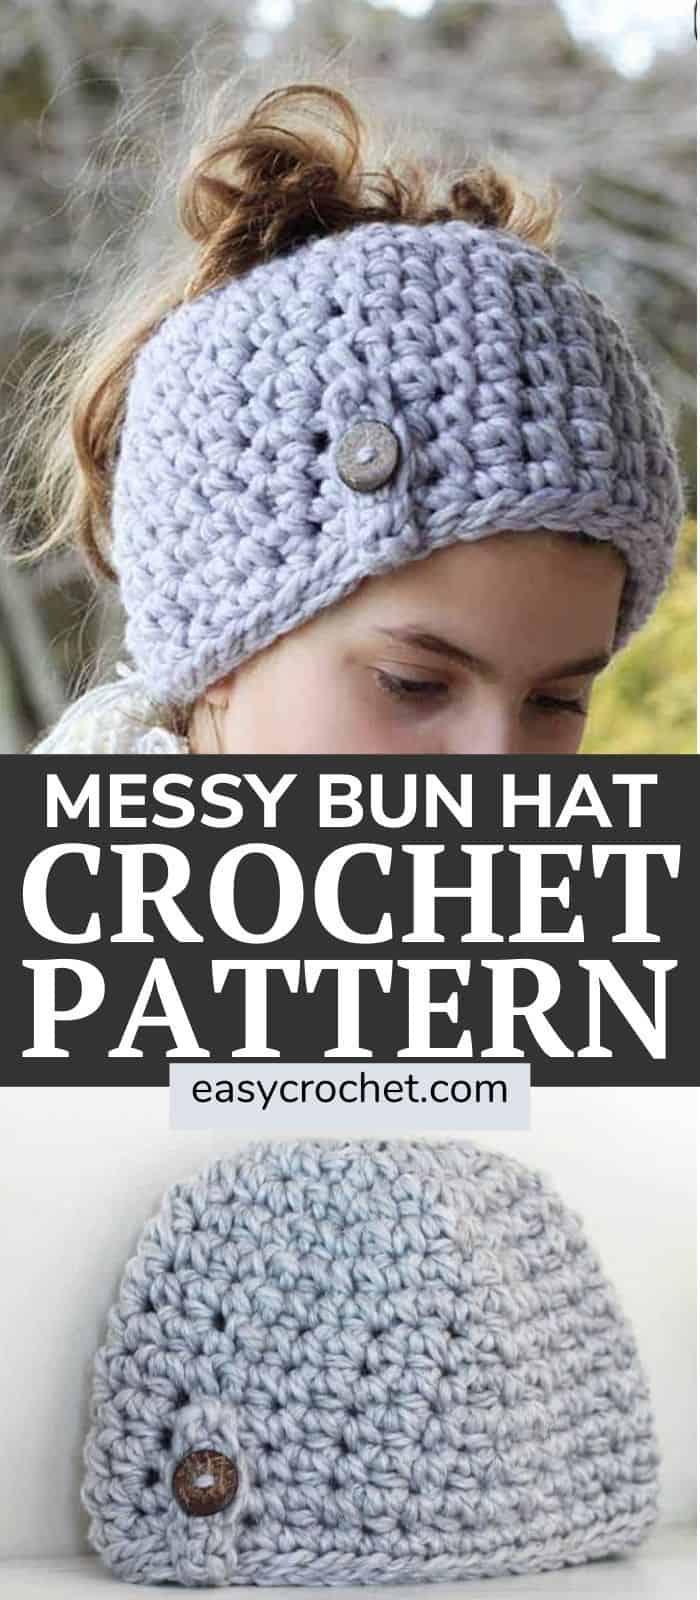 Messy Bun Hat Pattern via @easycrochetcom